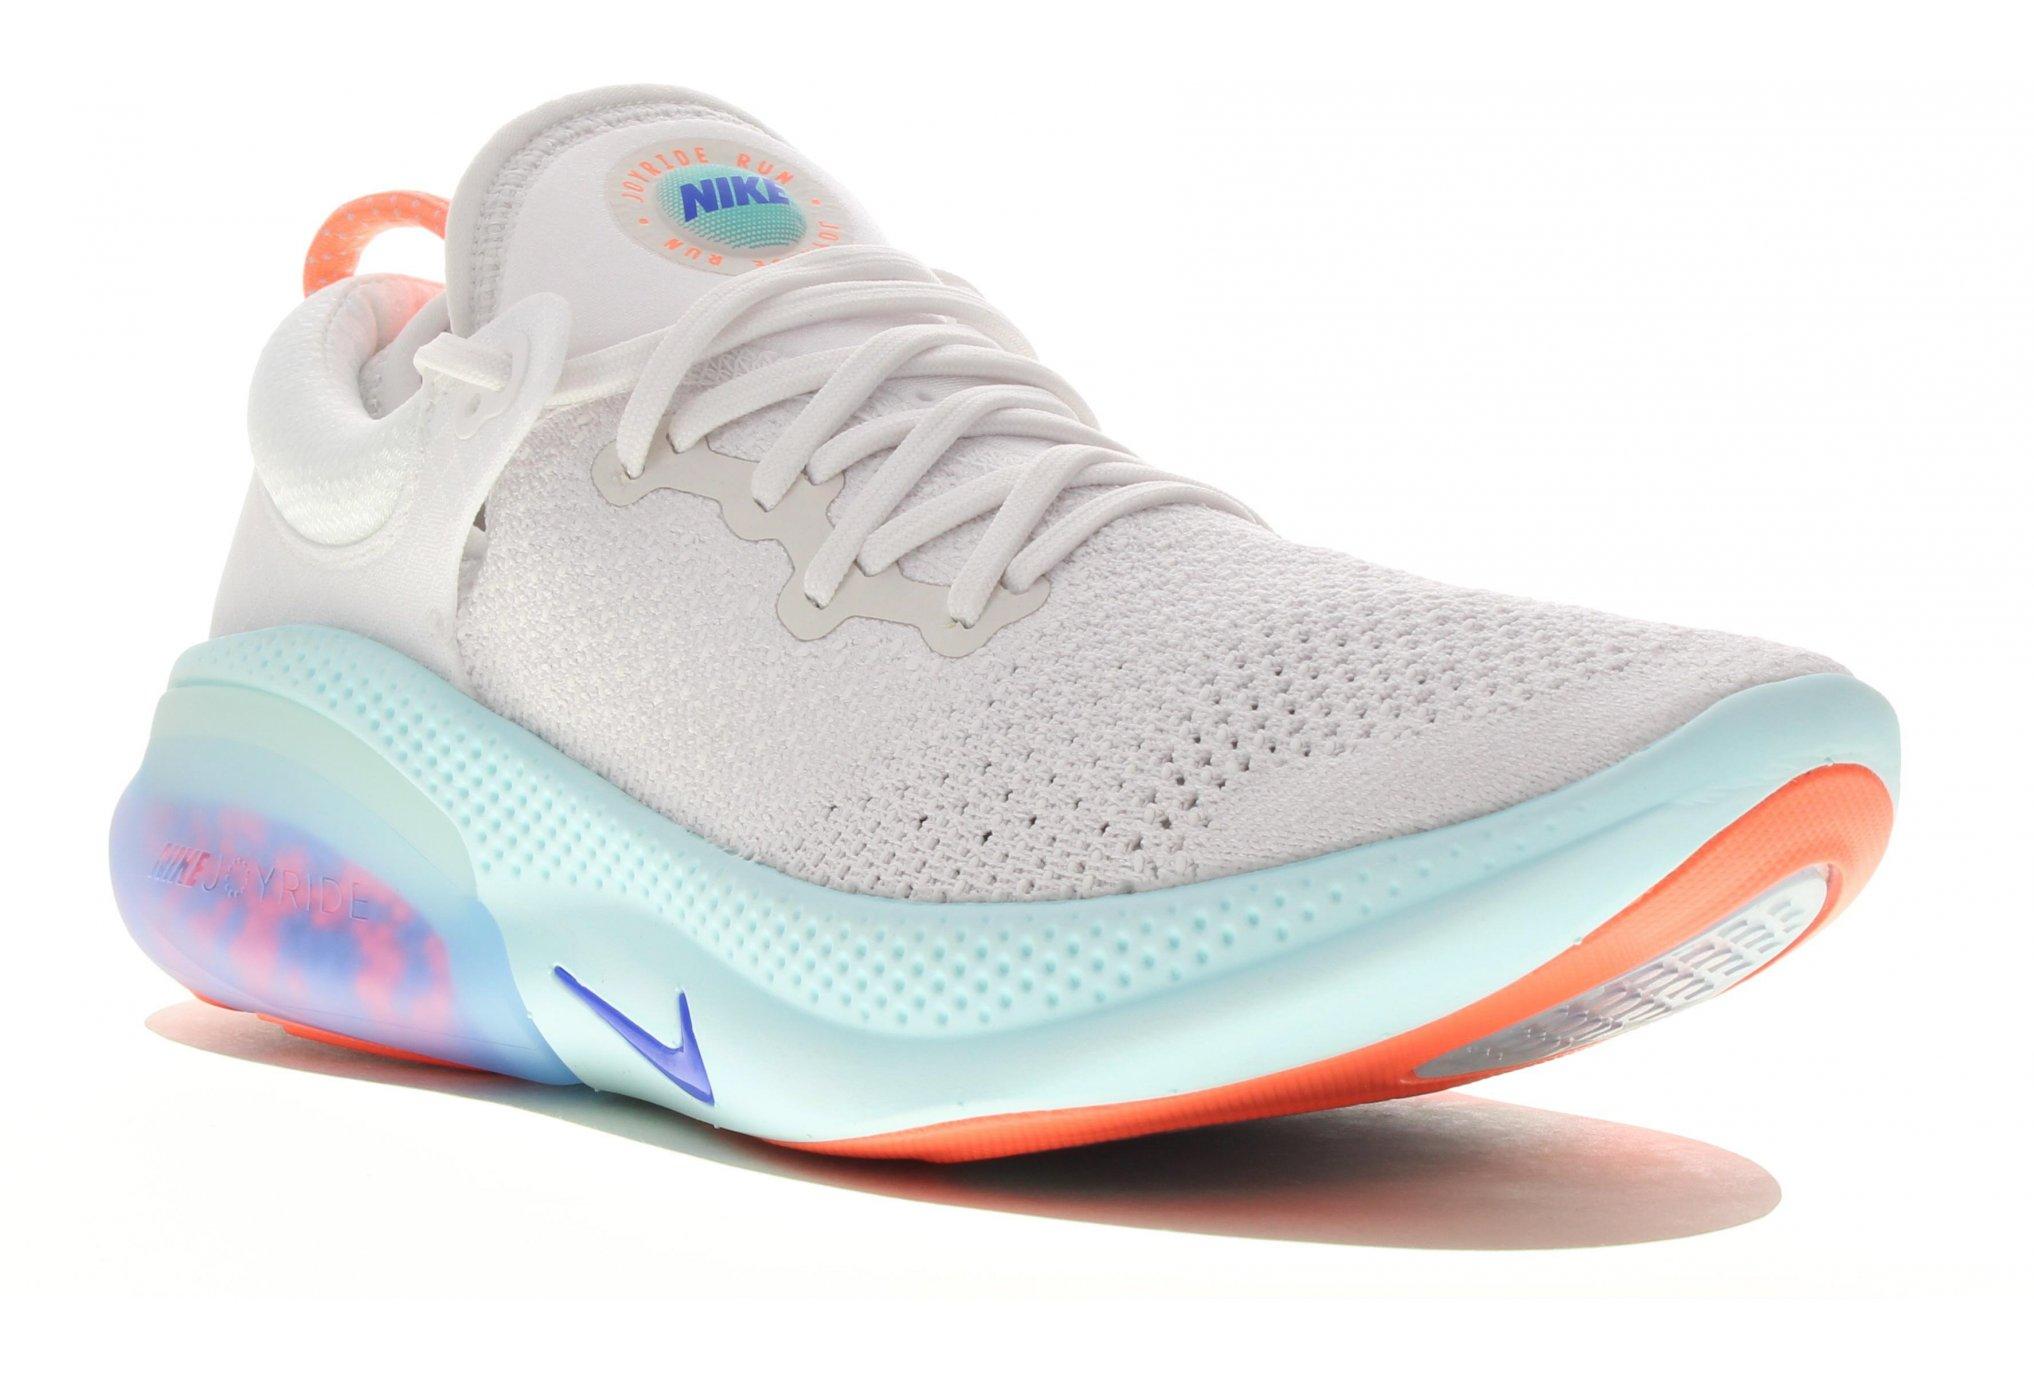 Nike Joyride Run Flyknit Chaussures homme